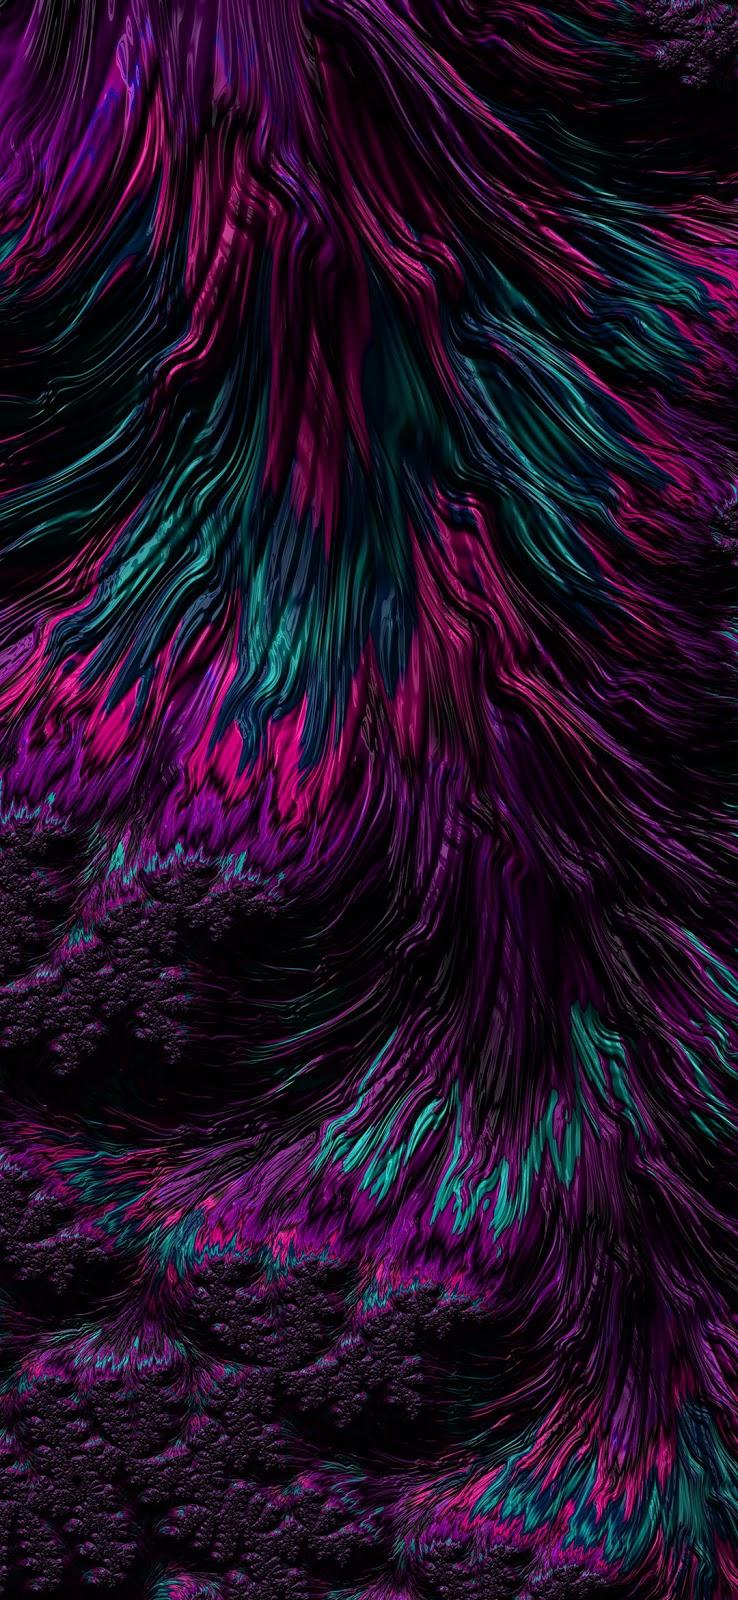 aesthetic dark purple waves wallpaper